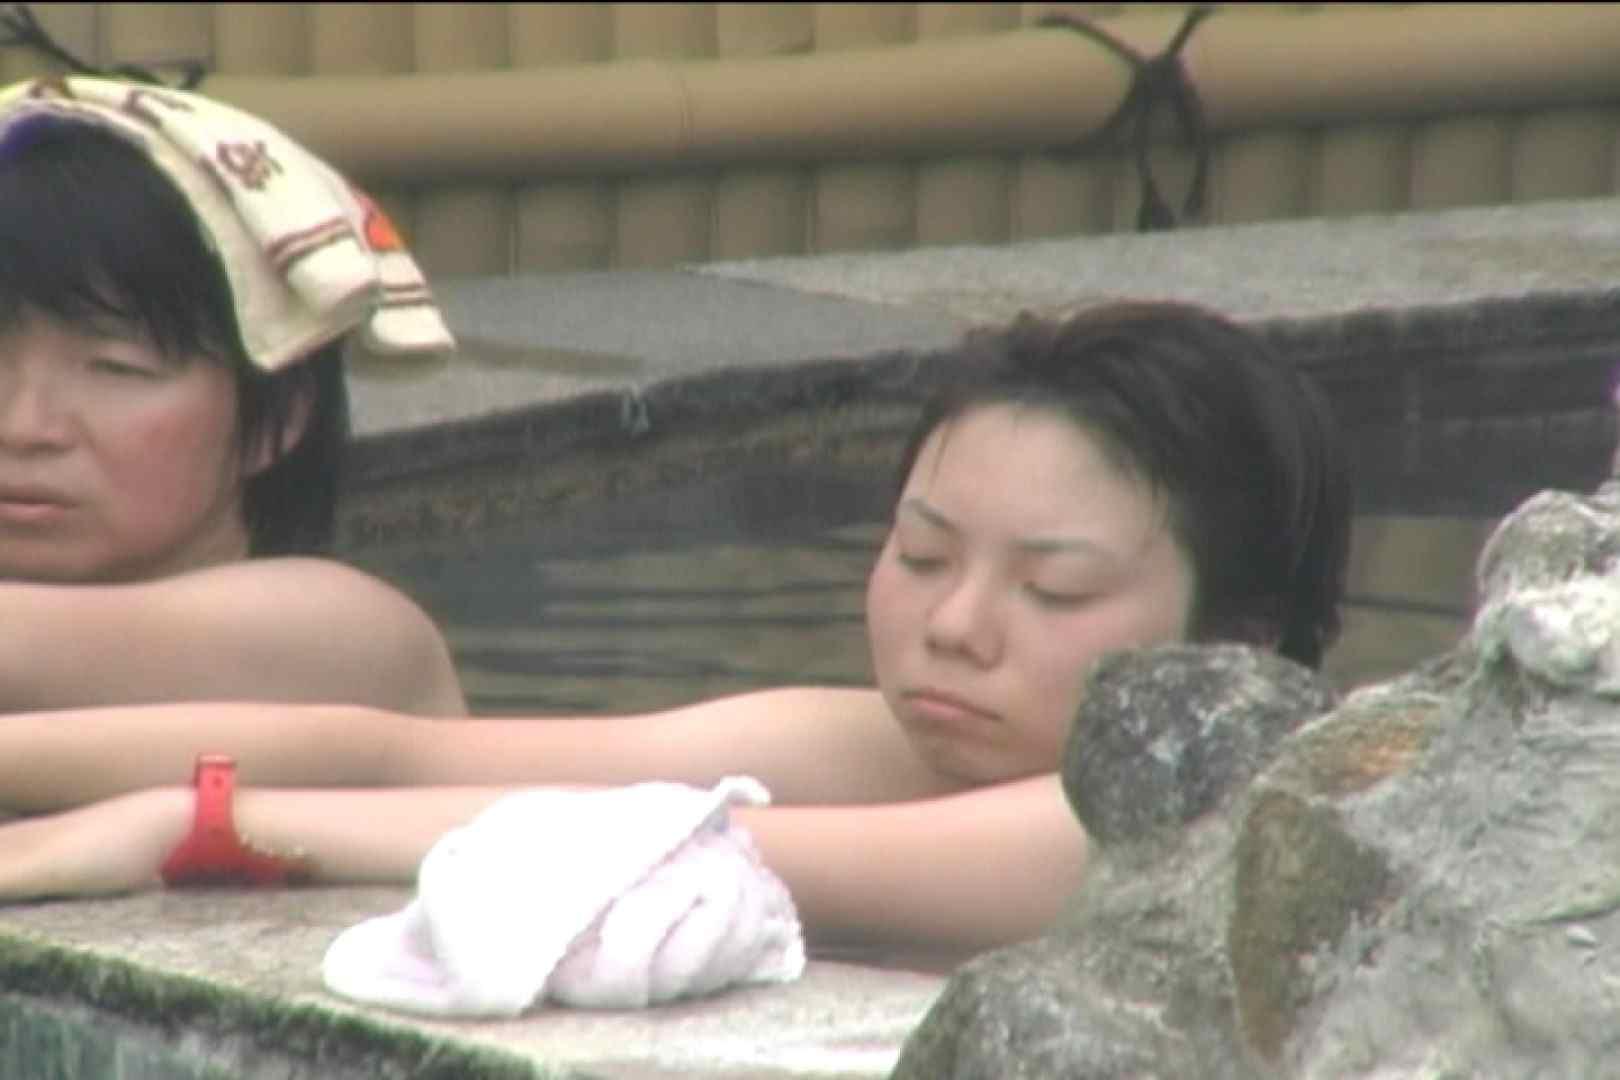 Aquaな露天風呂Vol.122 OLのプライベート | 盗撮特撮  10pic 10